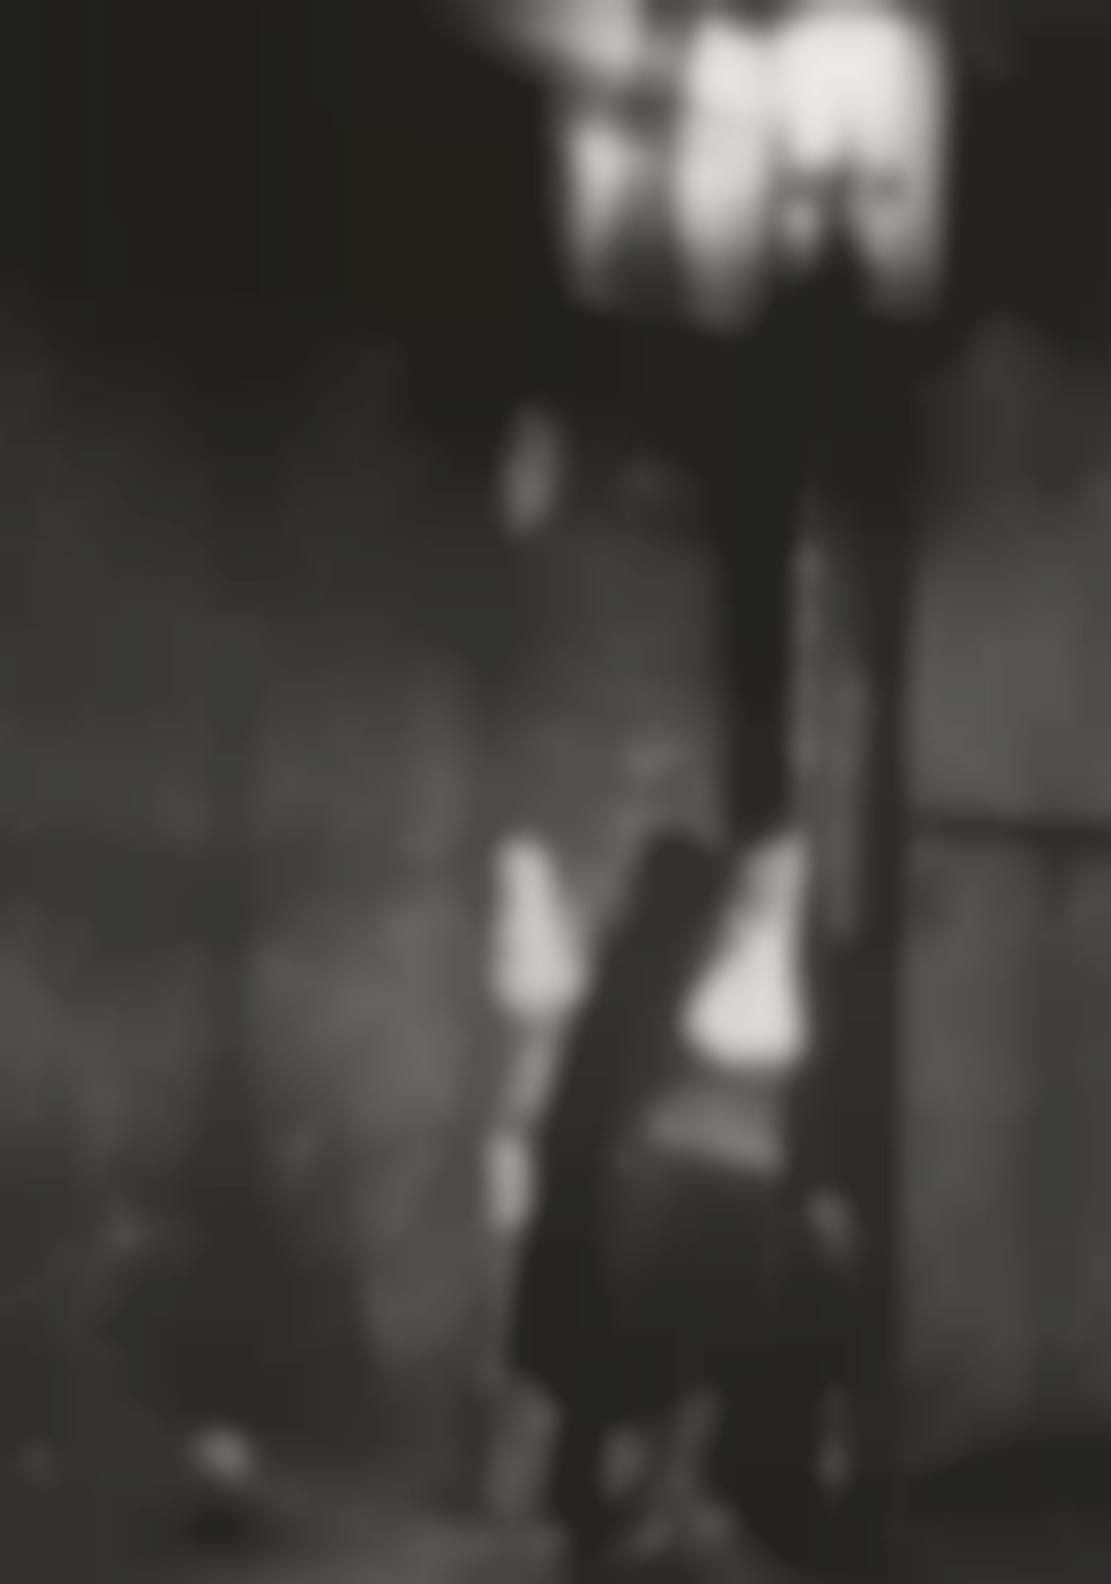 Brassai-Fille Adossee A Un Mur A Lecharpe Herminette-